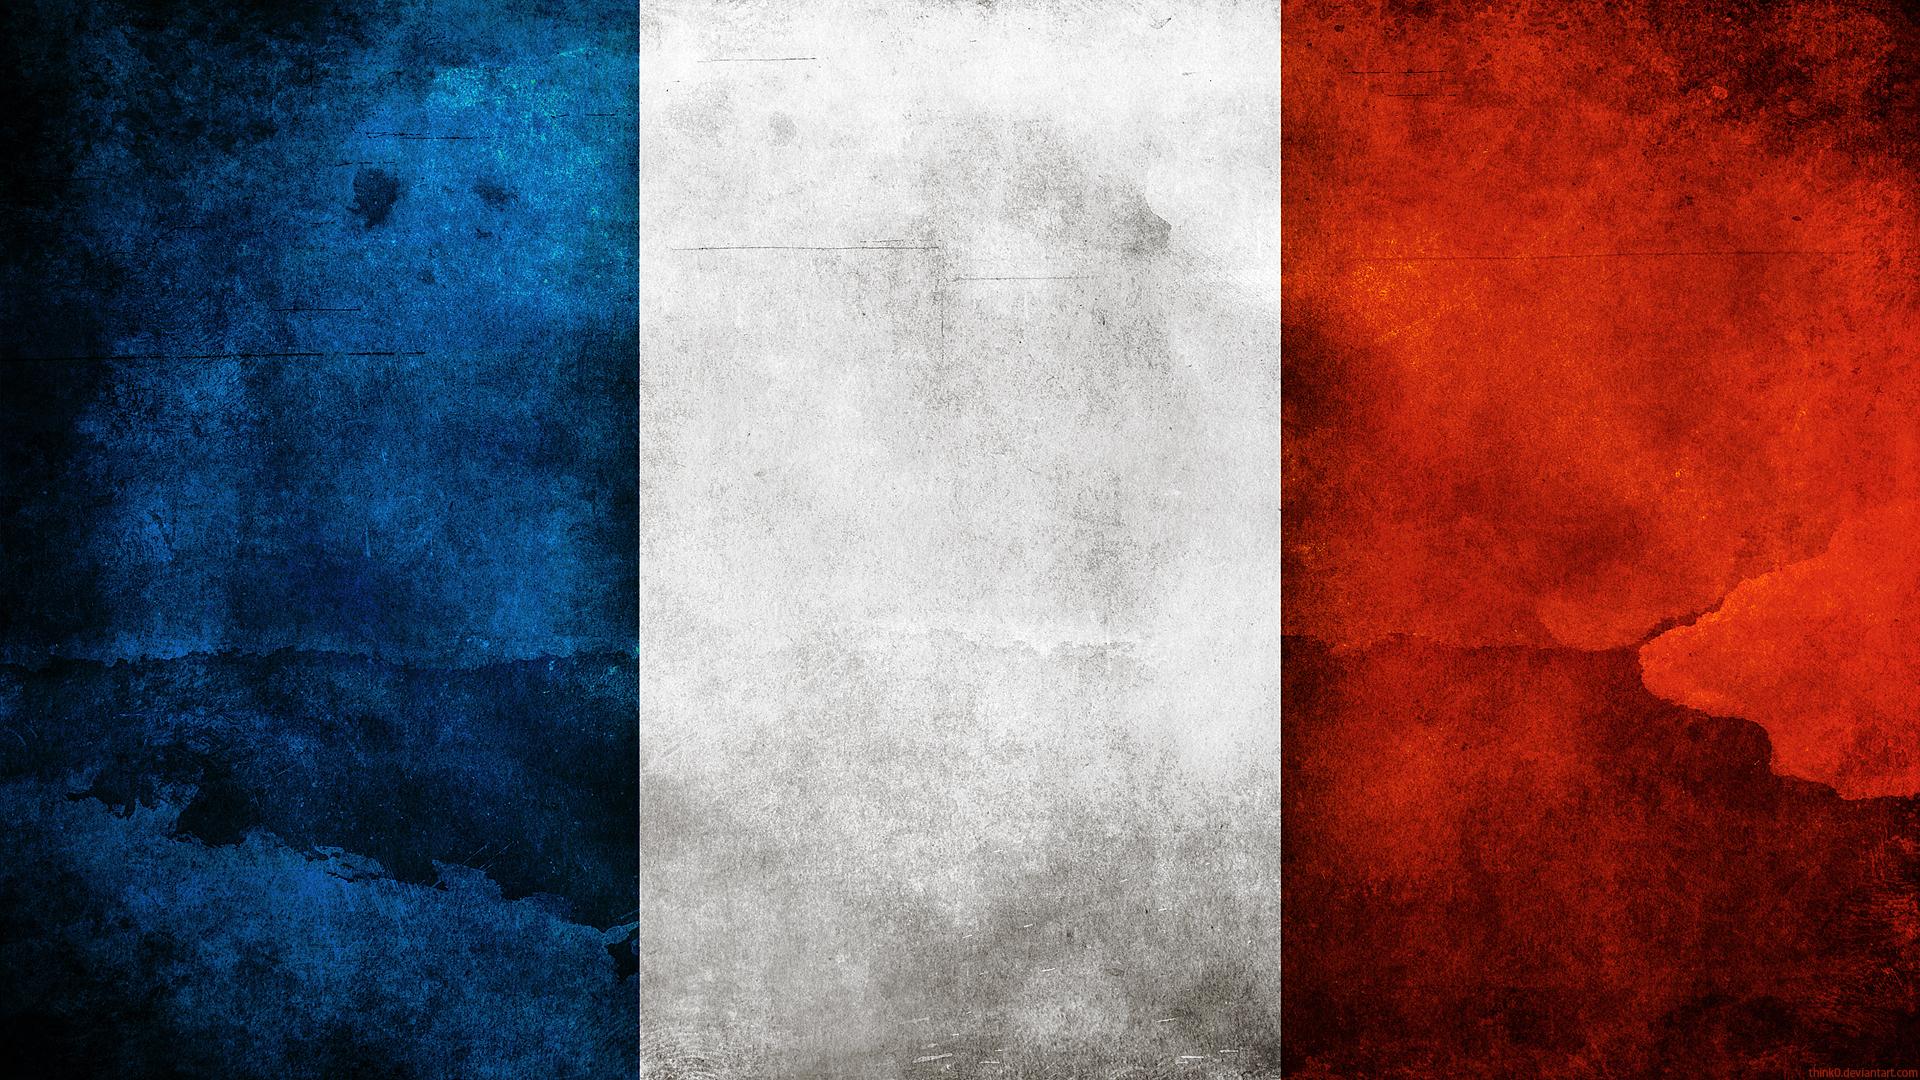 Image france flag by think0 d563k6eg alternative history france flag by think0 d563k6eg publicscrutiny Choice Image